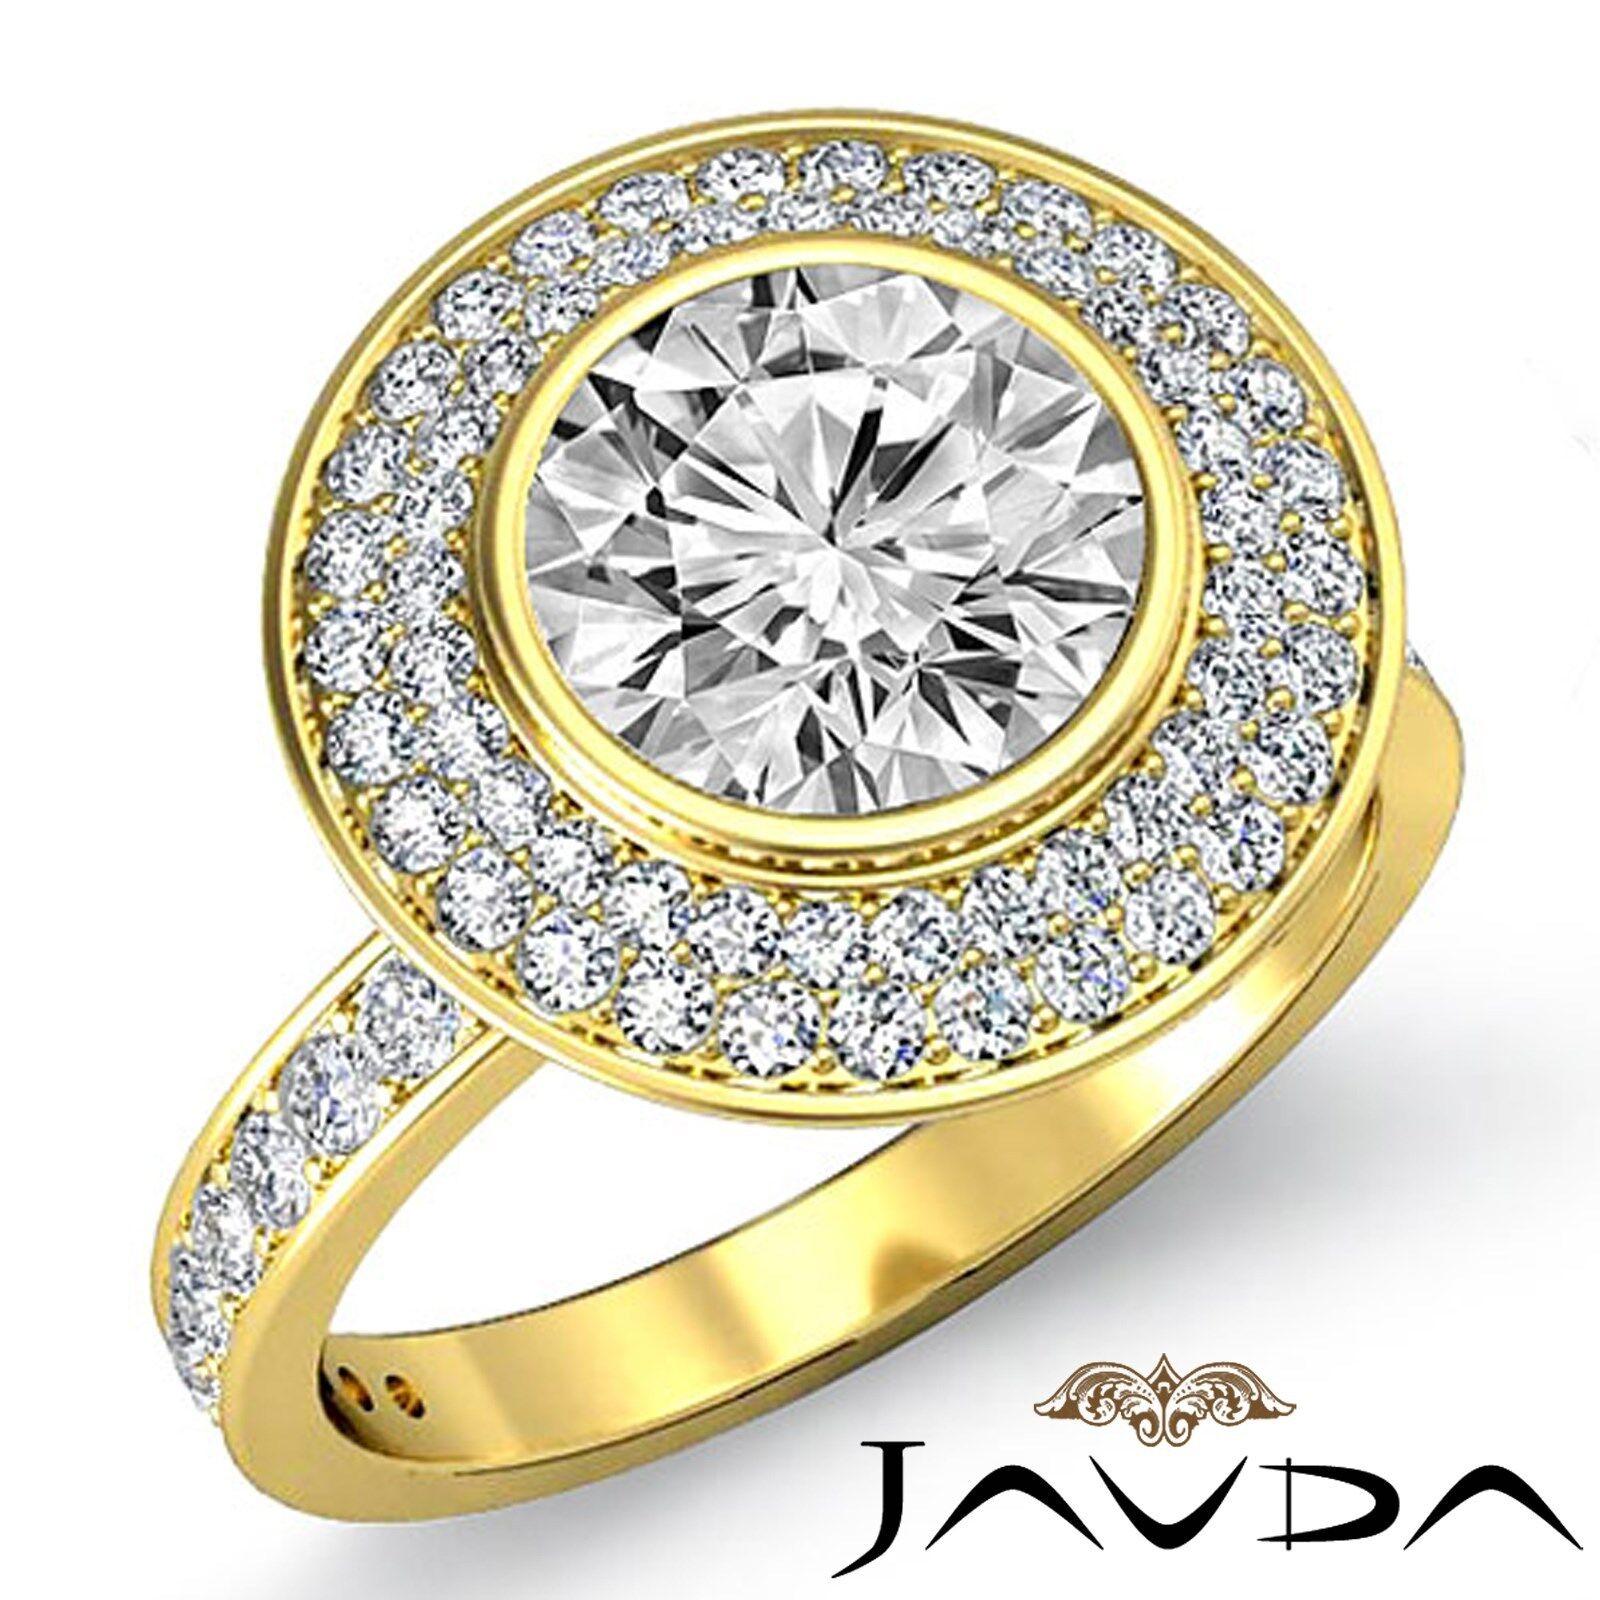 Double Halo Round Cut Diamond Engagement Pave Bezel Seting Ring GIA I SI1 2.25Ct